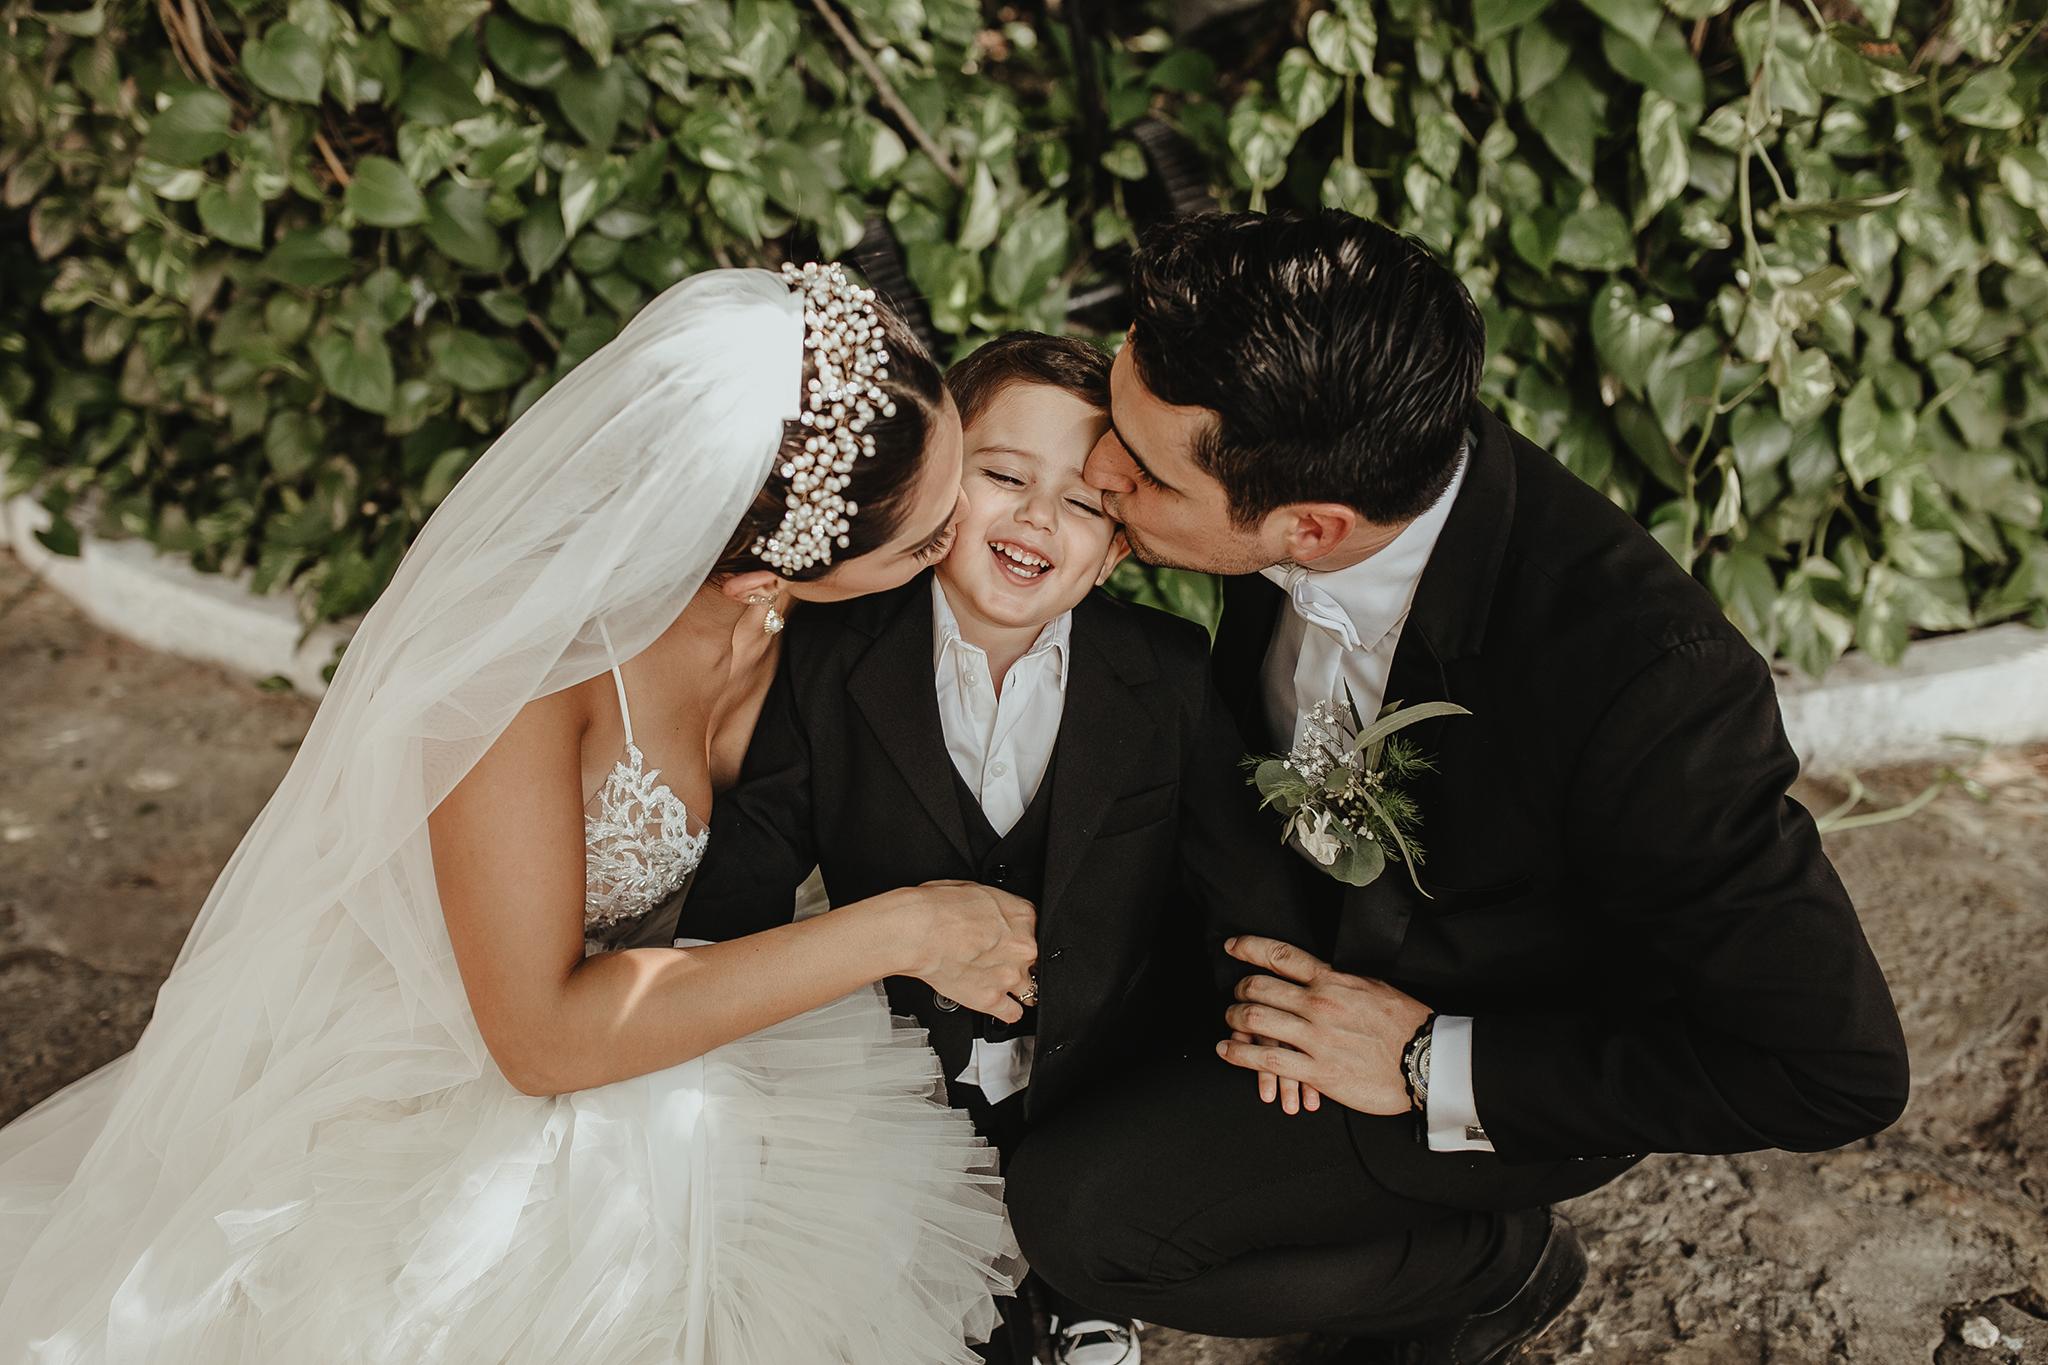 0446R&F__WeddingDestination_Weddingmerida_BodaMexico_FotografoDeBodas_FabrizioSimoneenFotografo.jpg